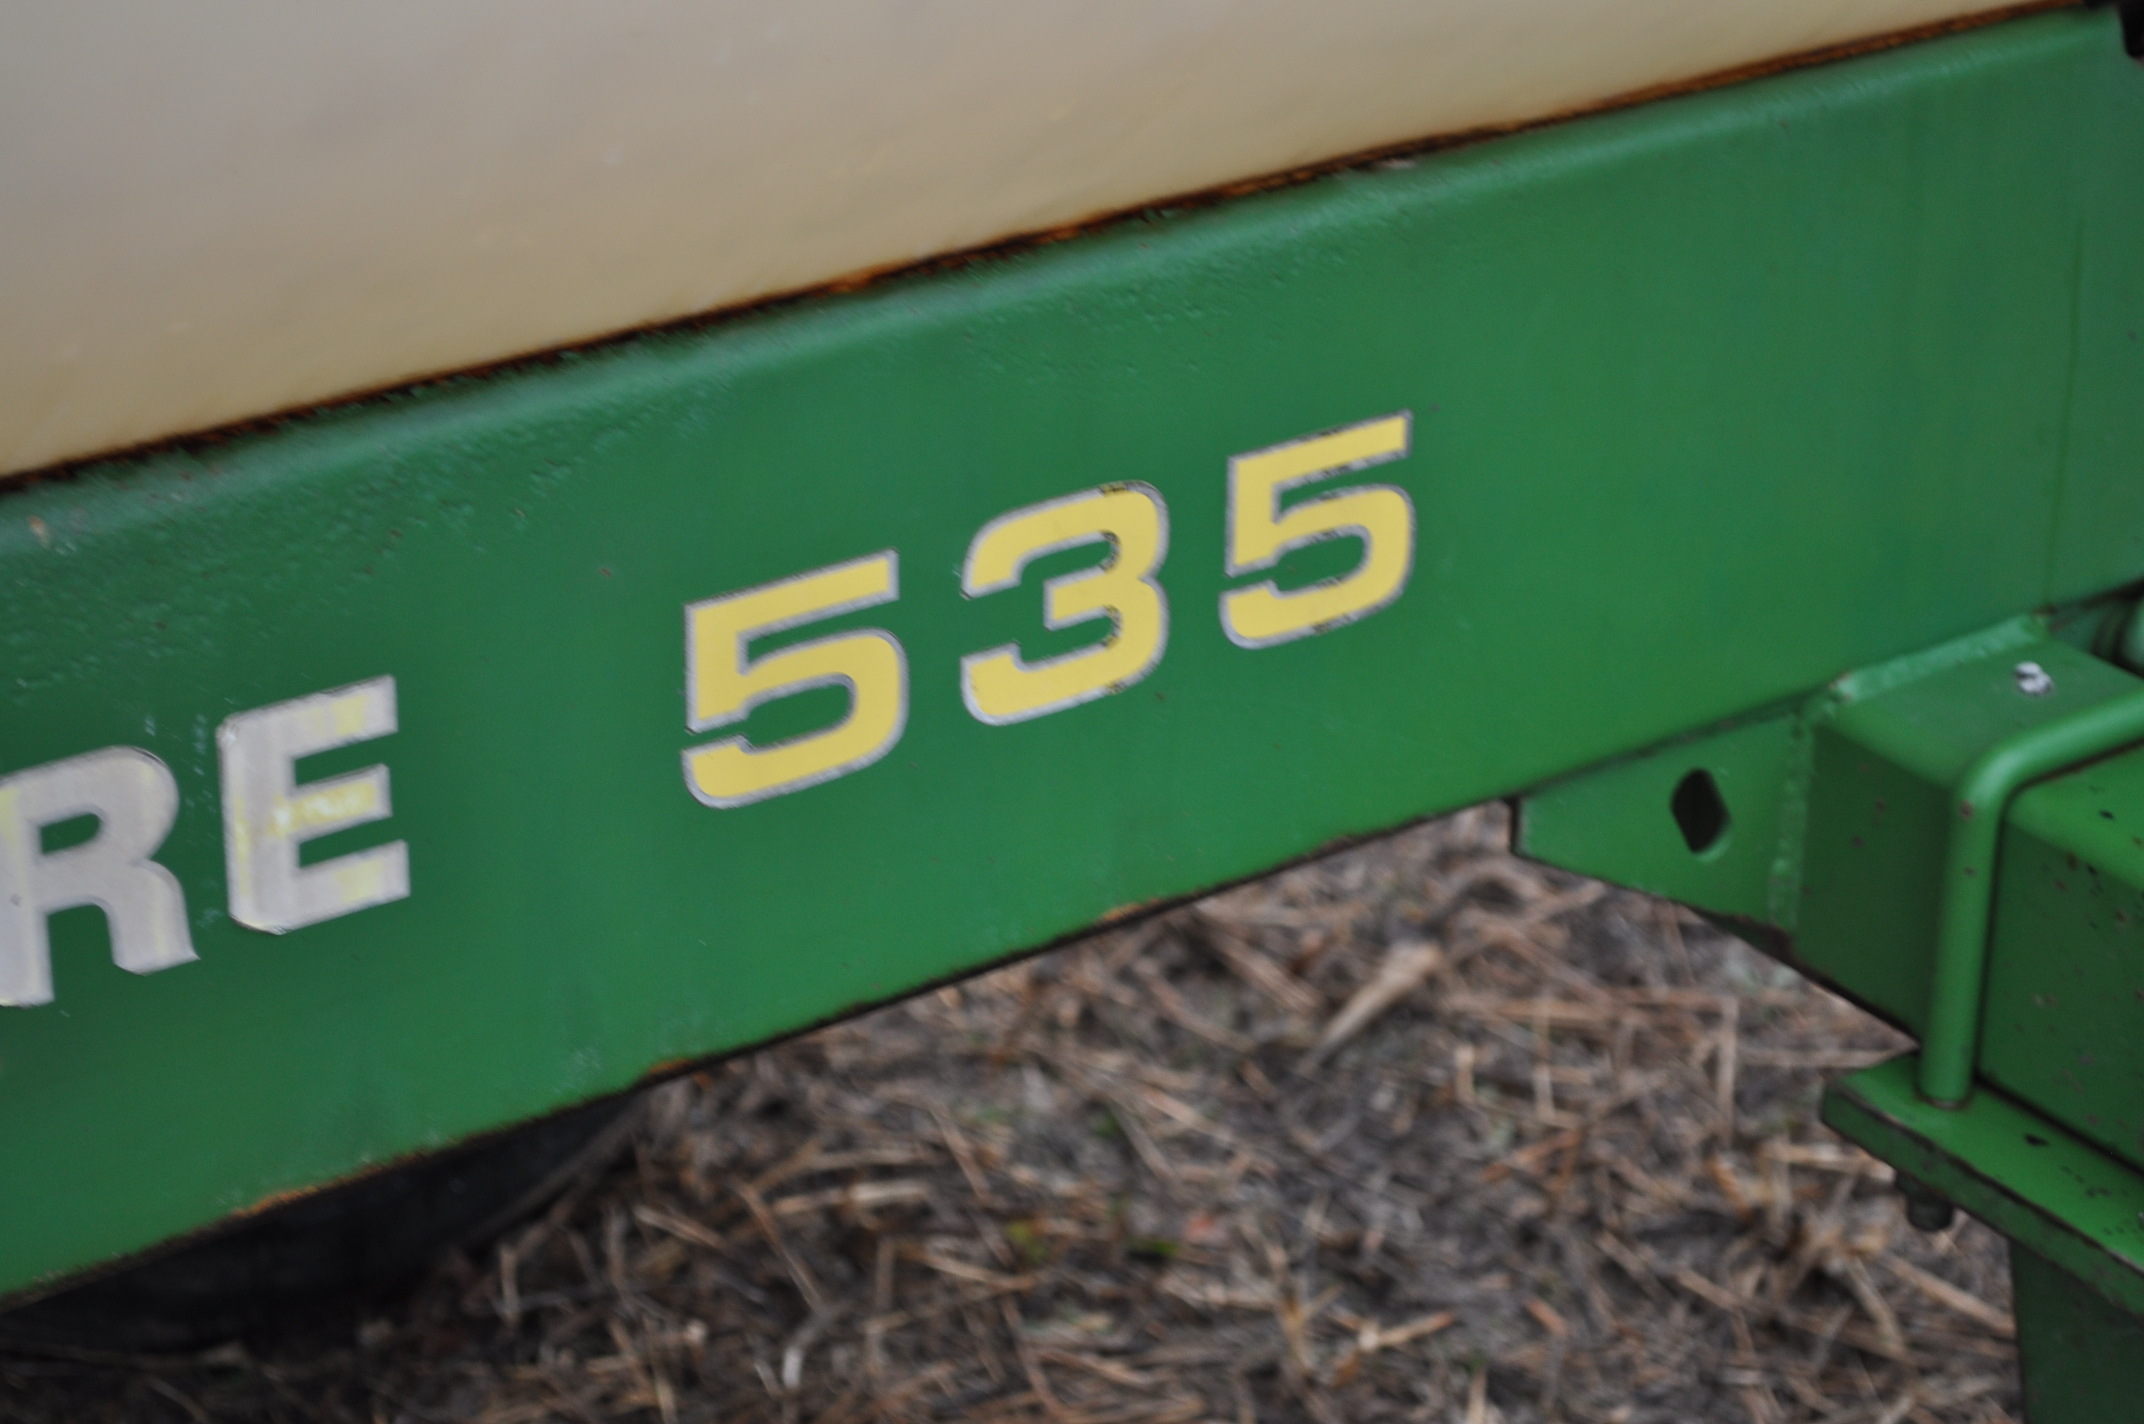 John Deere 535 pull-type sprayer, 350 gallon tank, 30' boom - Image 4 of 11